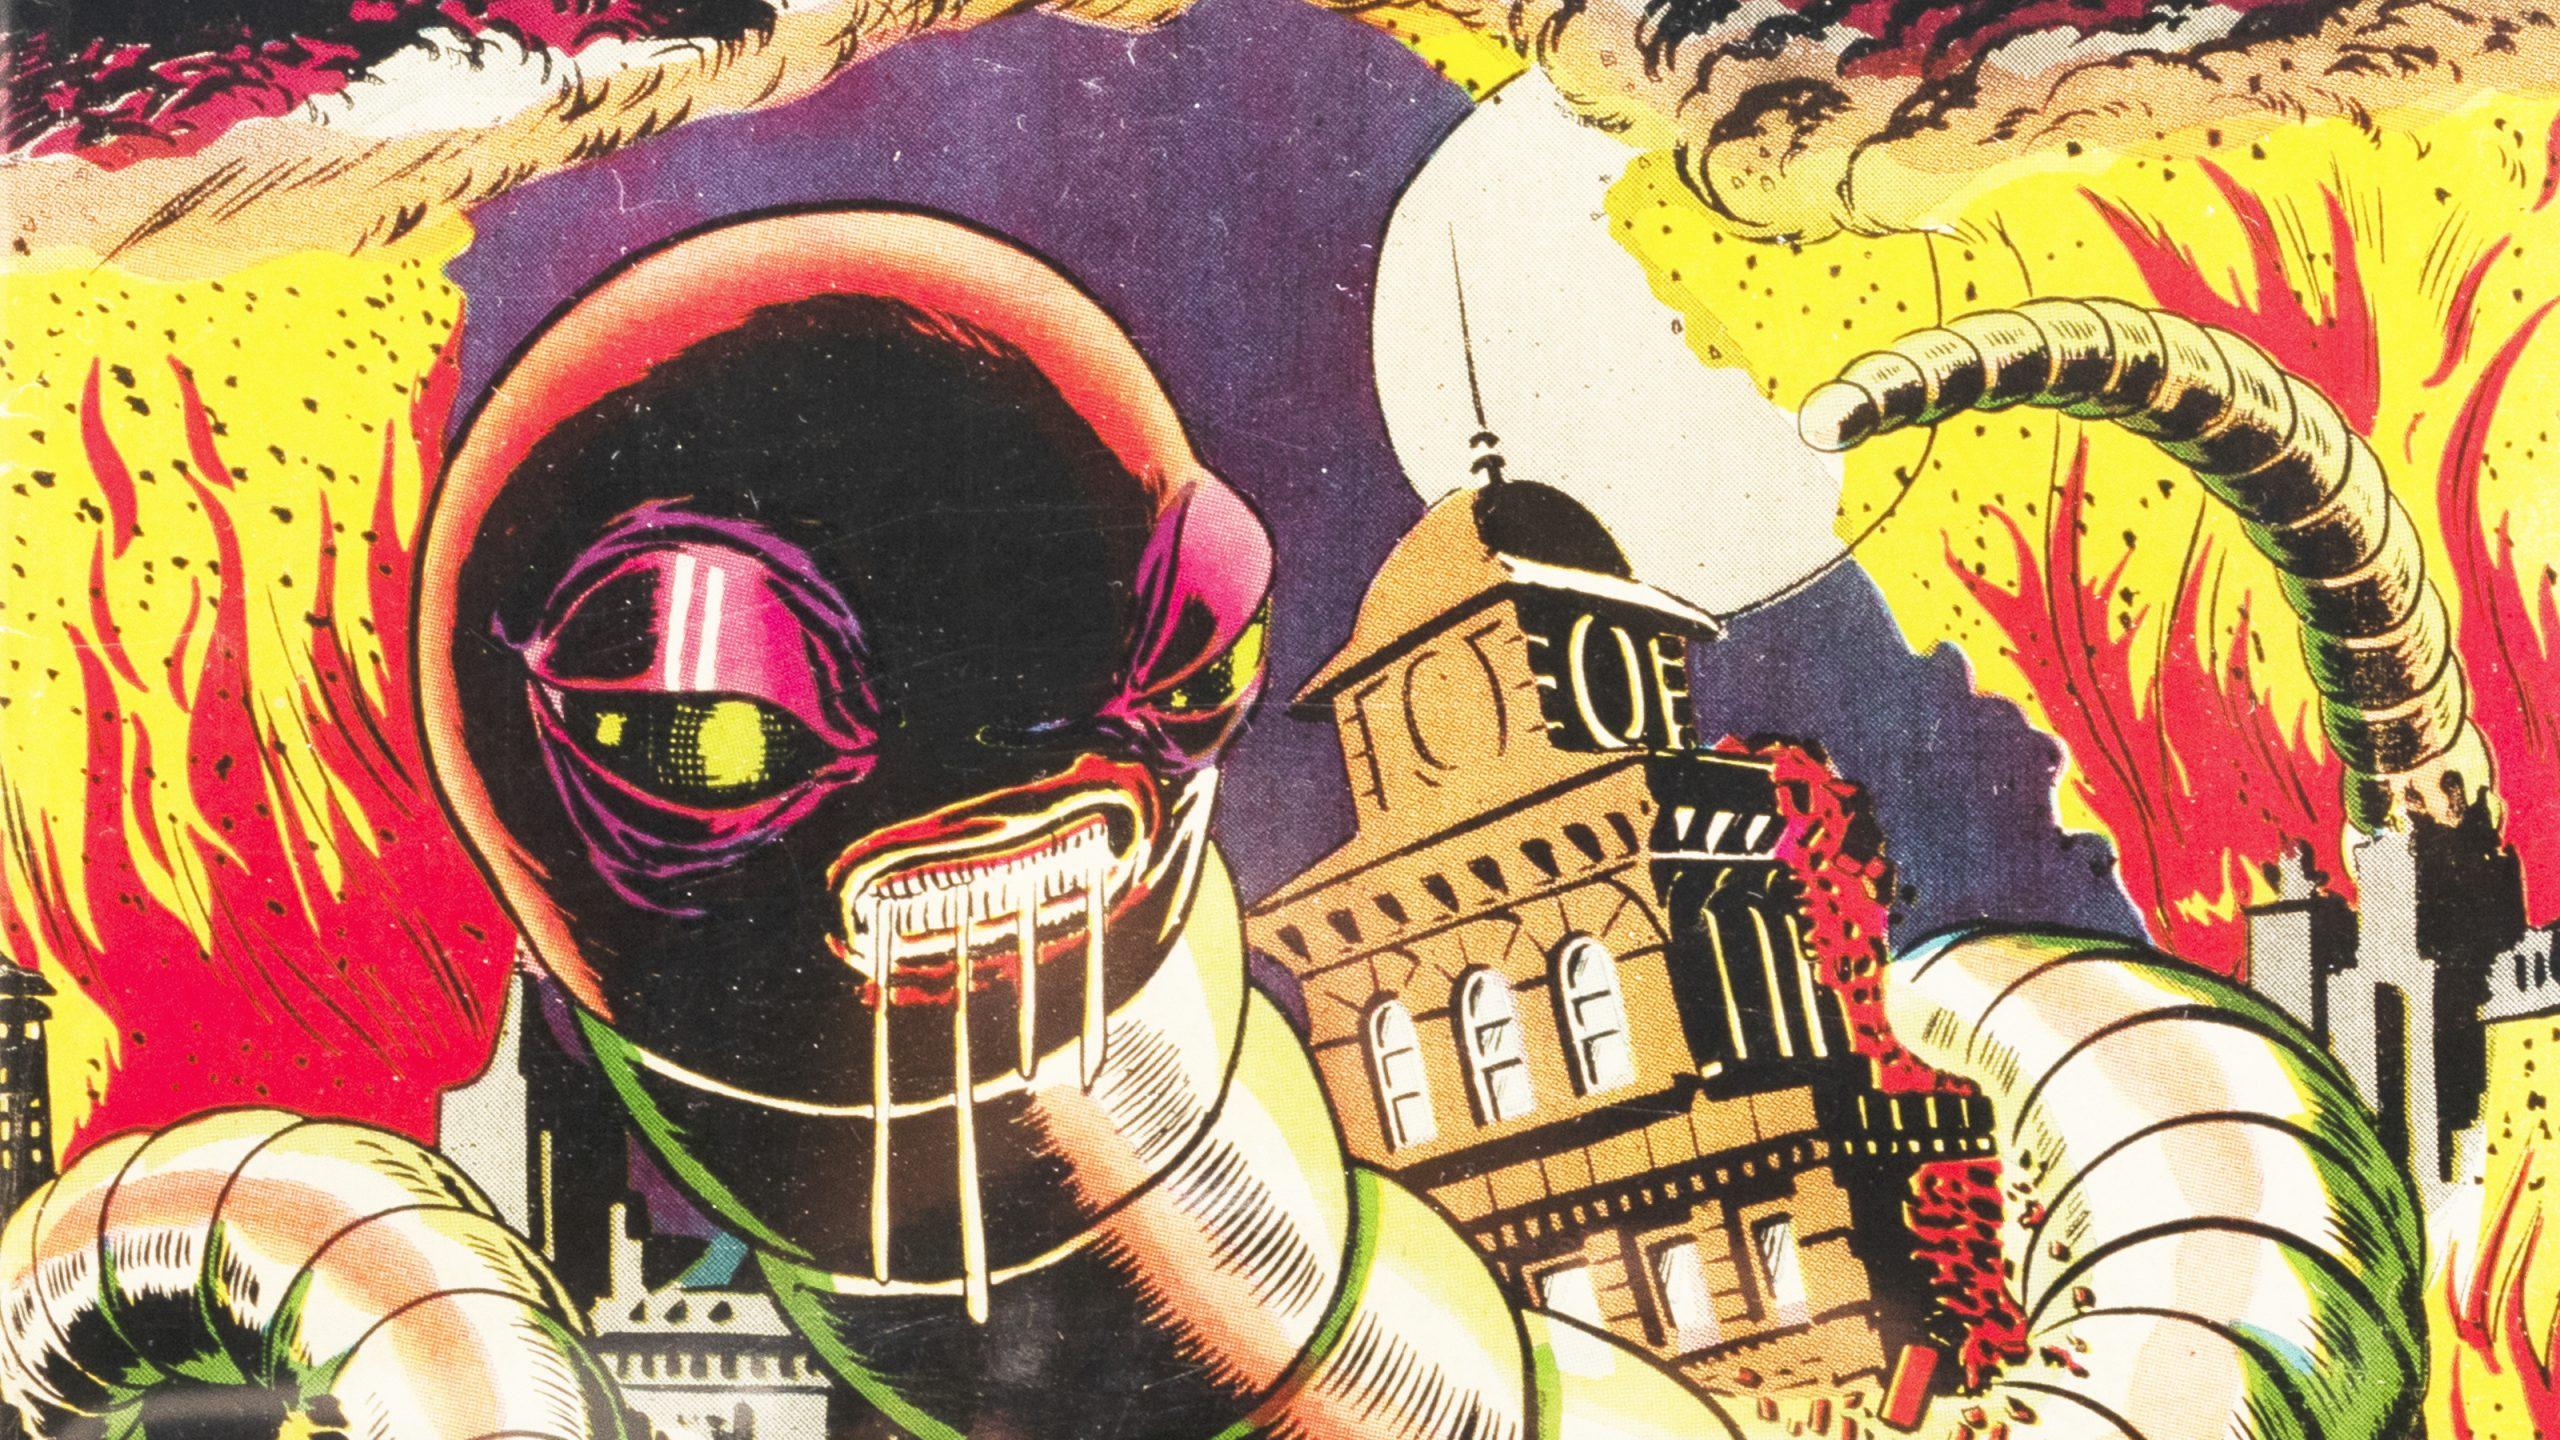 Sale 698: Comic Books & Original Comic Art